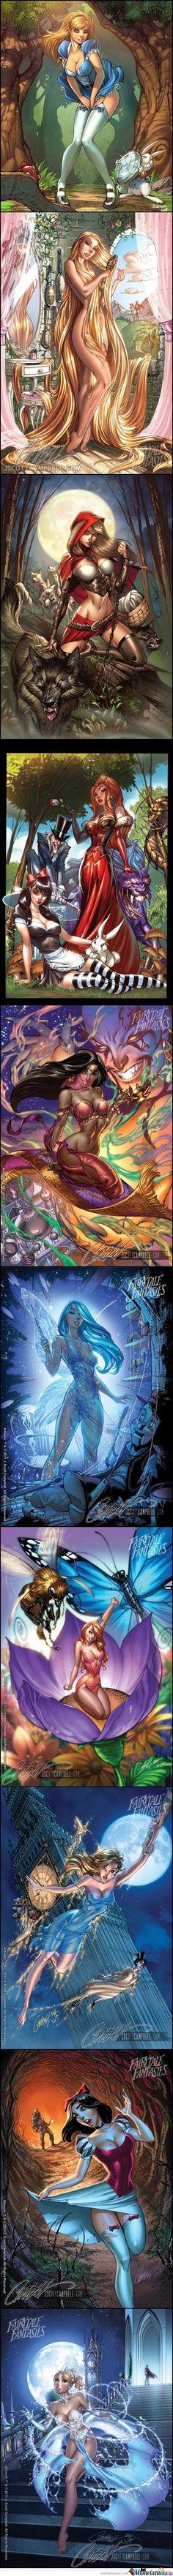 Disney fairy tales by J Scott Campbell, Grim Fairytales Series